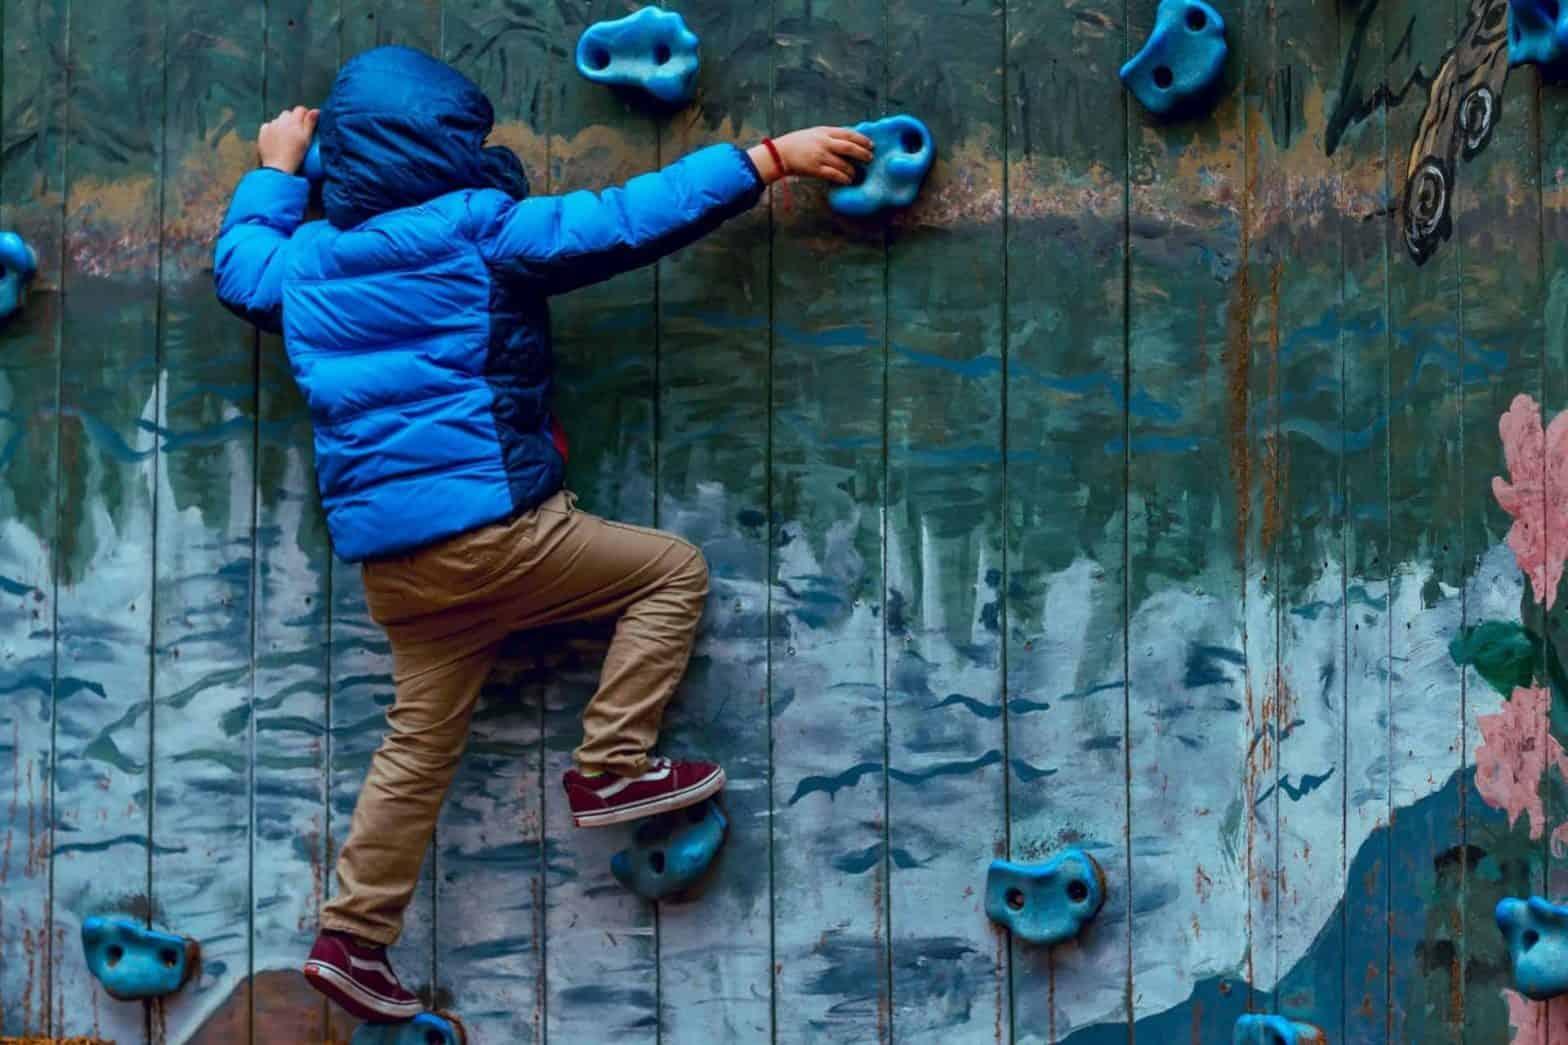 boy wall climbing